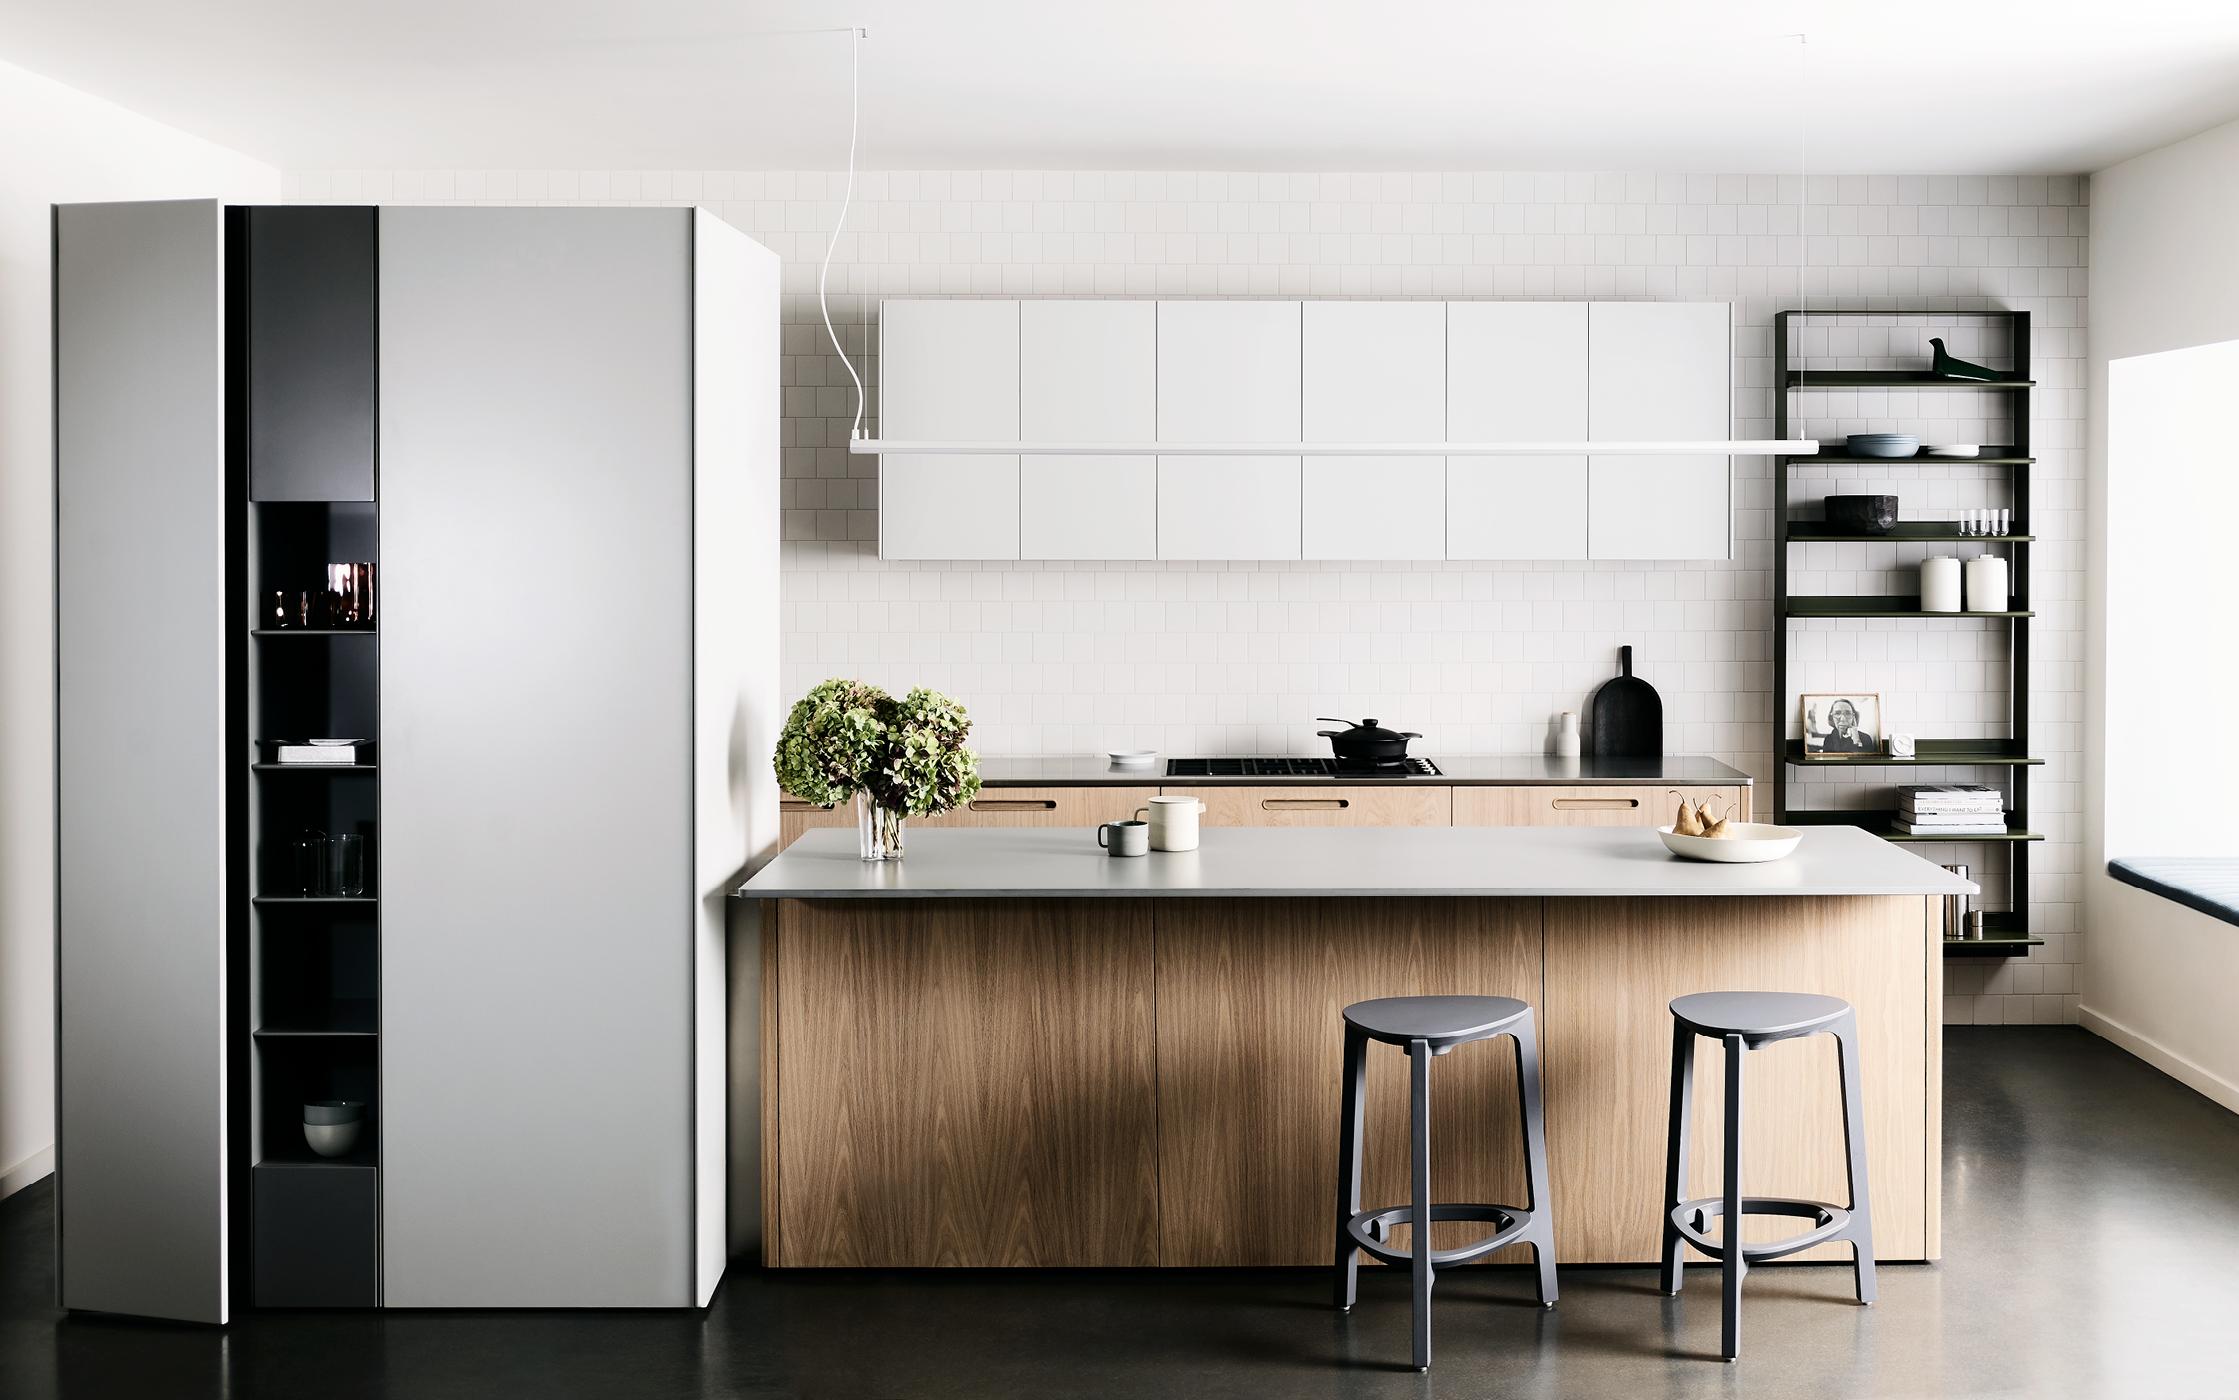 Tableau Kitchen System by Cantilever DesignOffice Melbourne Australia